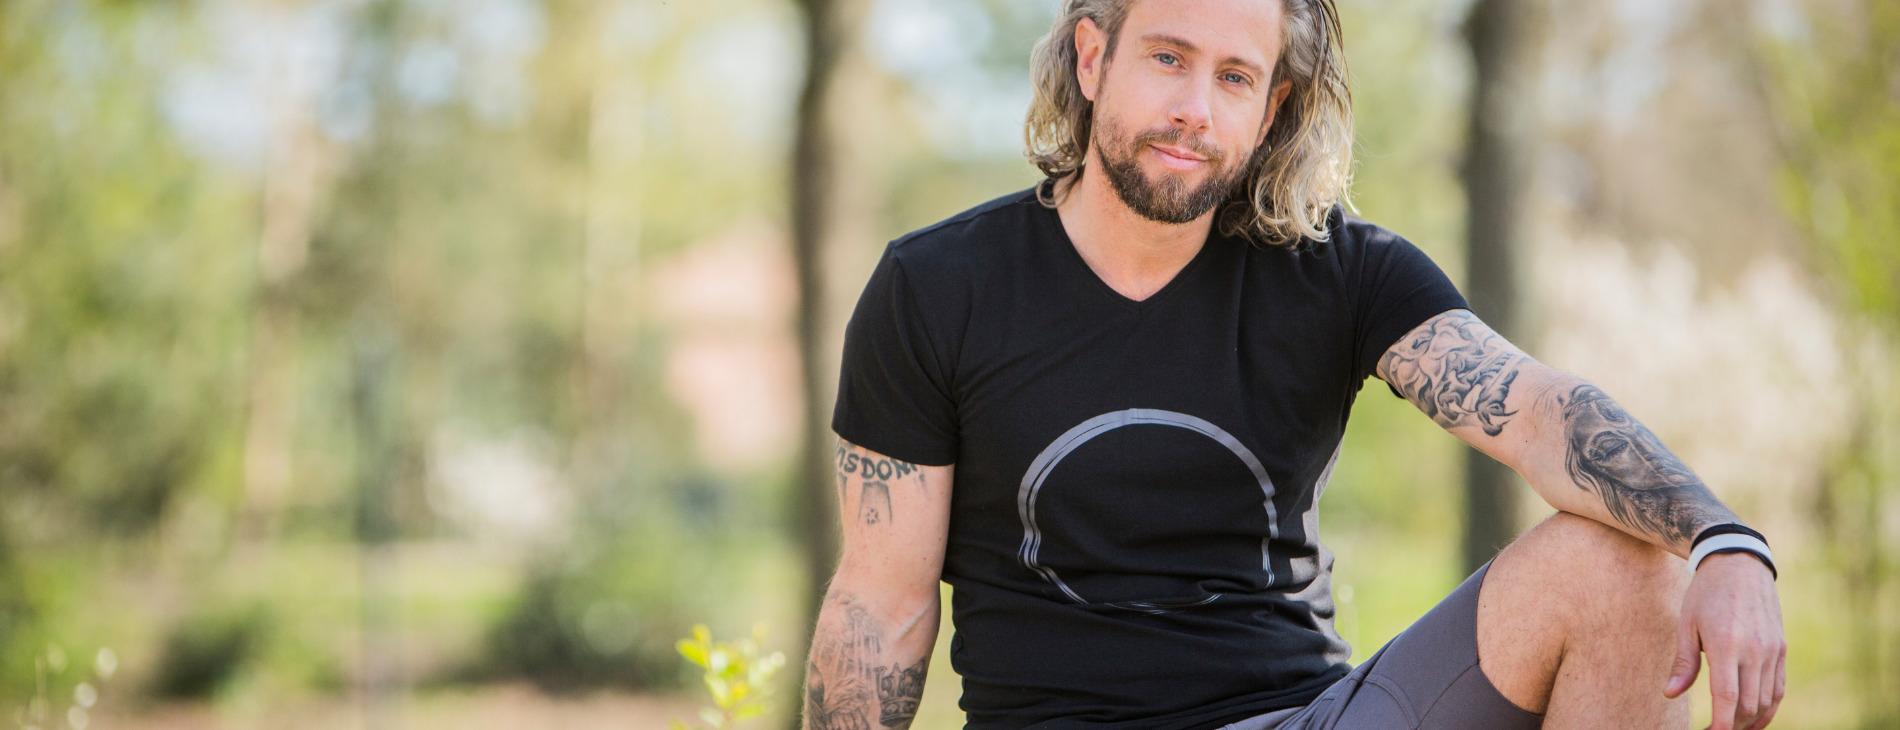 Renegade Guru - Sustainable Yoga & Active Wear - Homepage Banner